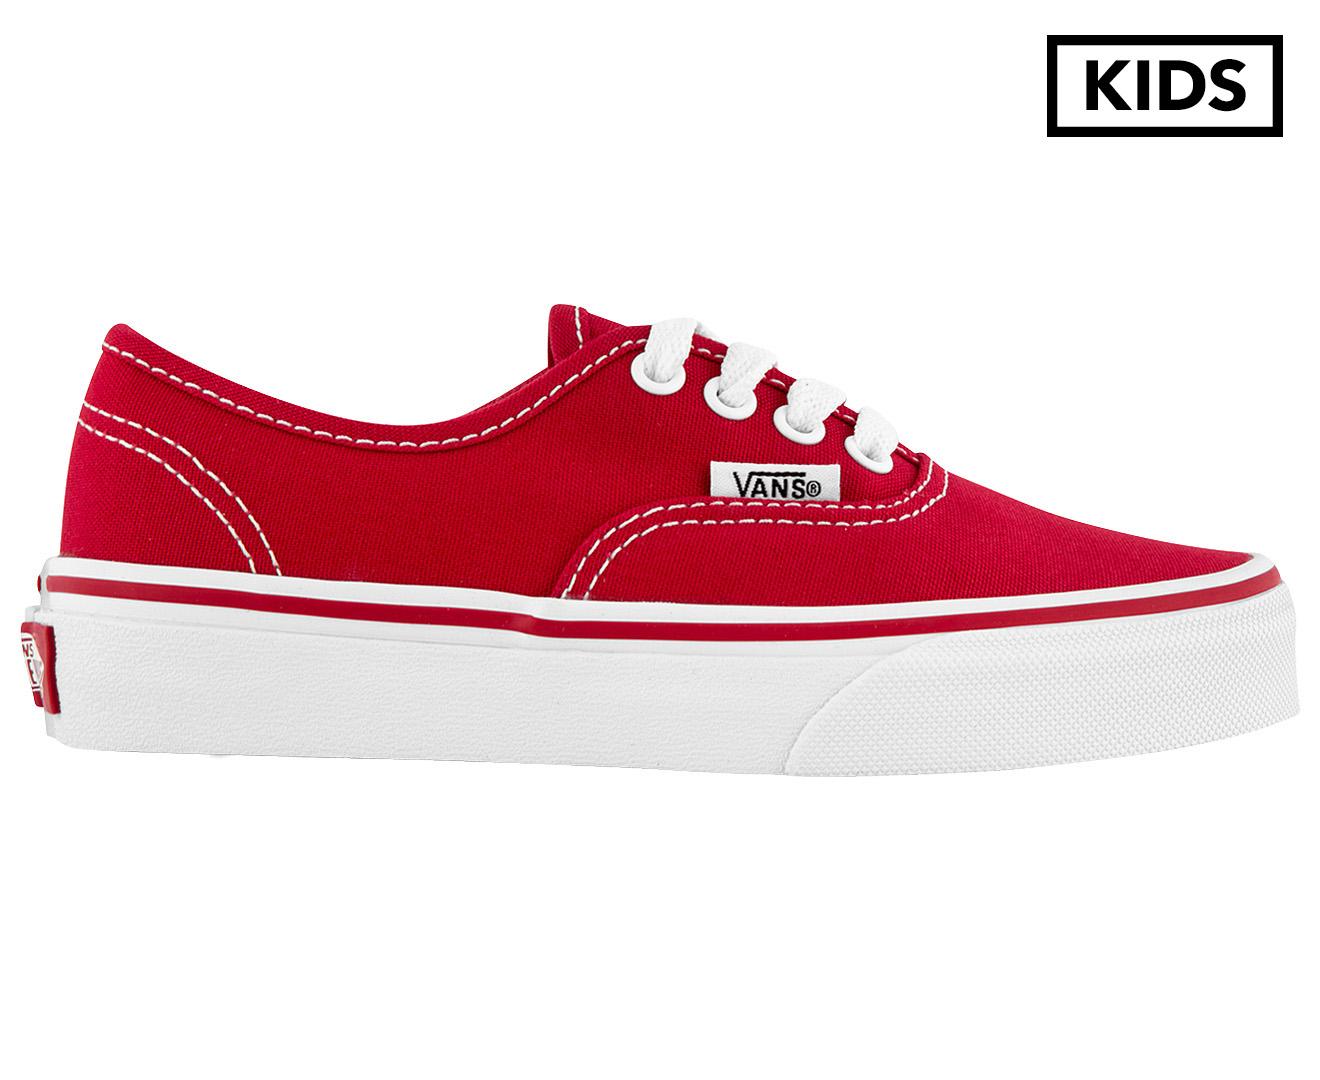 a06e6654228167 Vans Kids  Authentic Shoe - Red True White